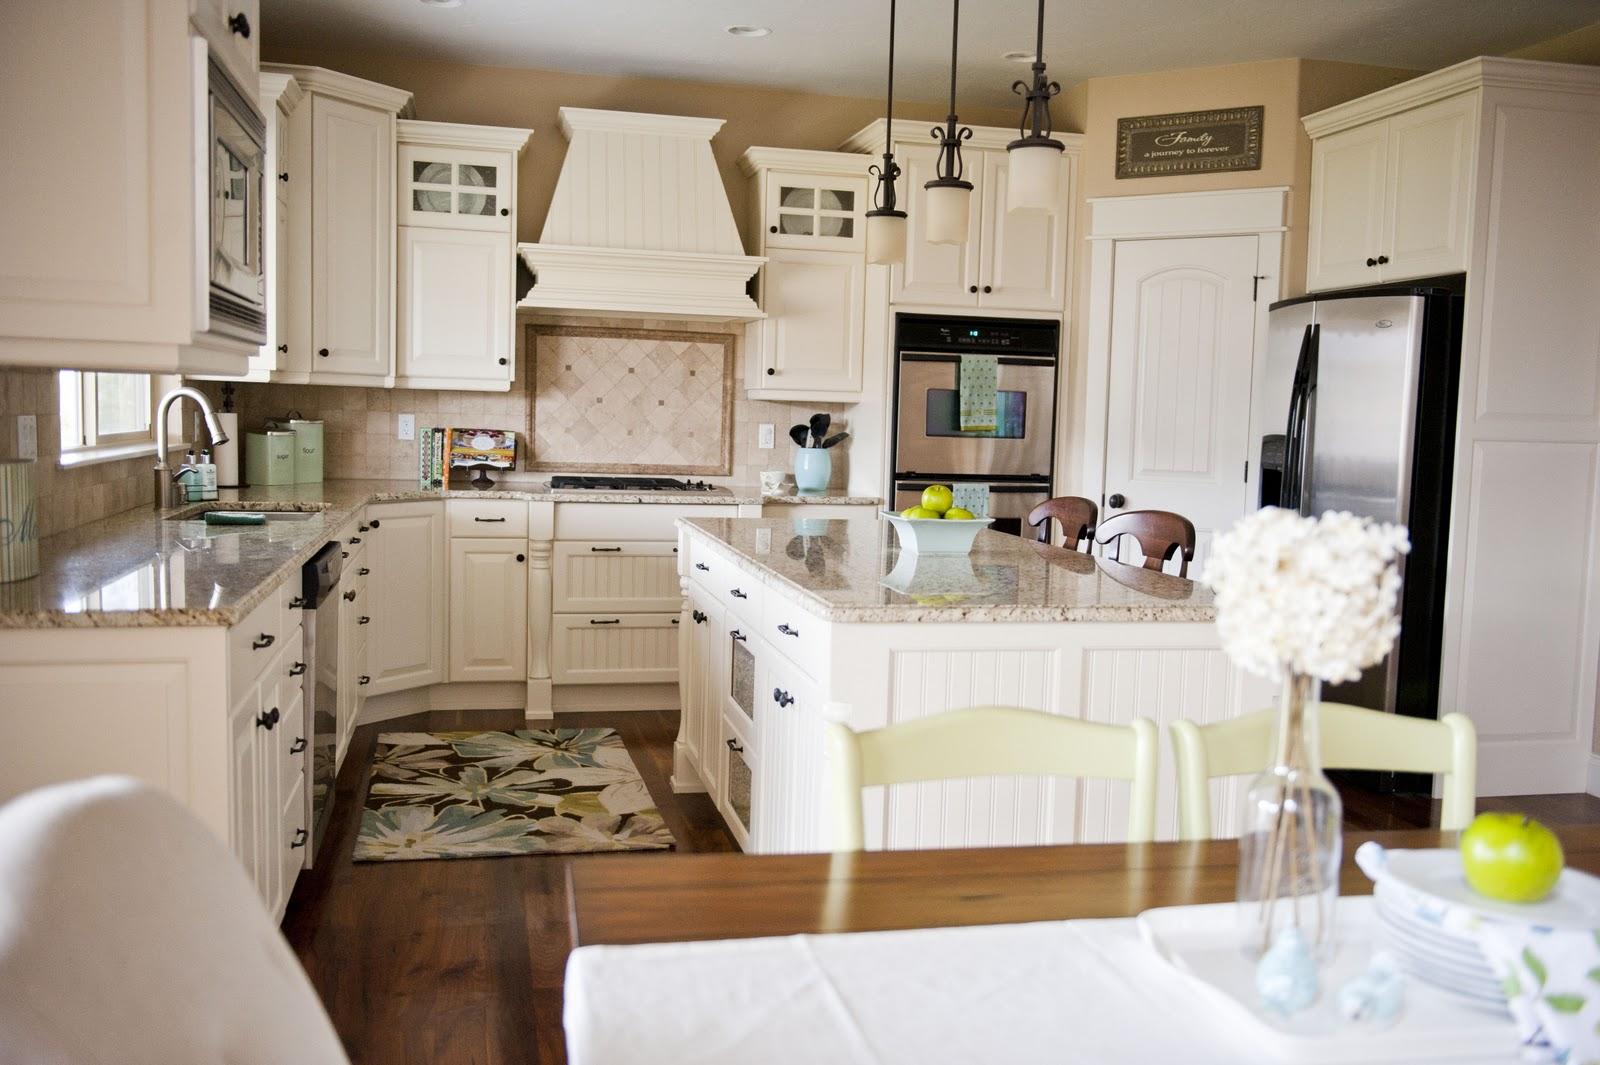 My Home Tour: Kitchen